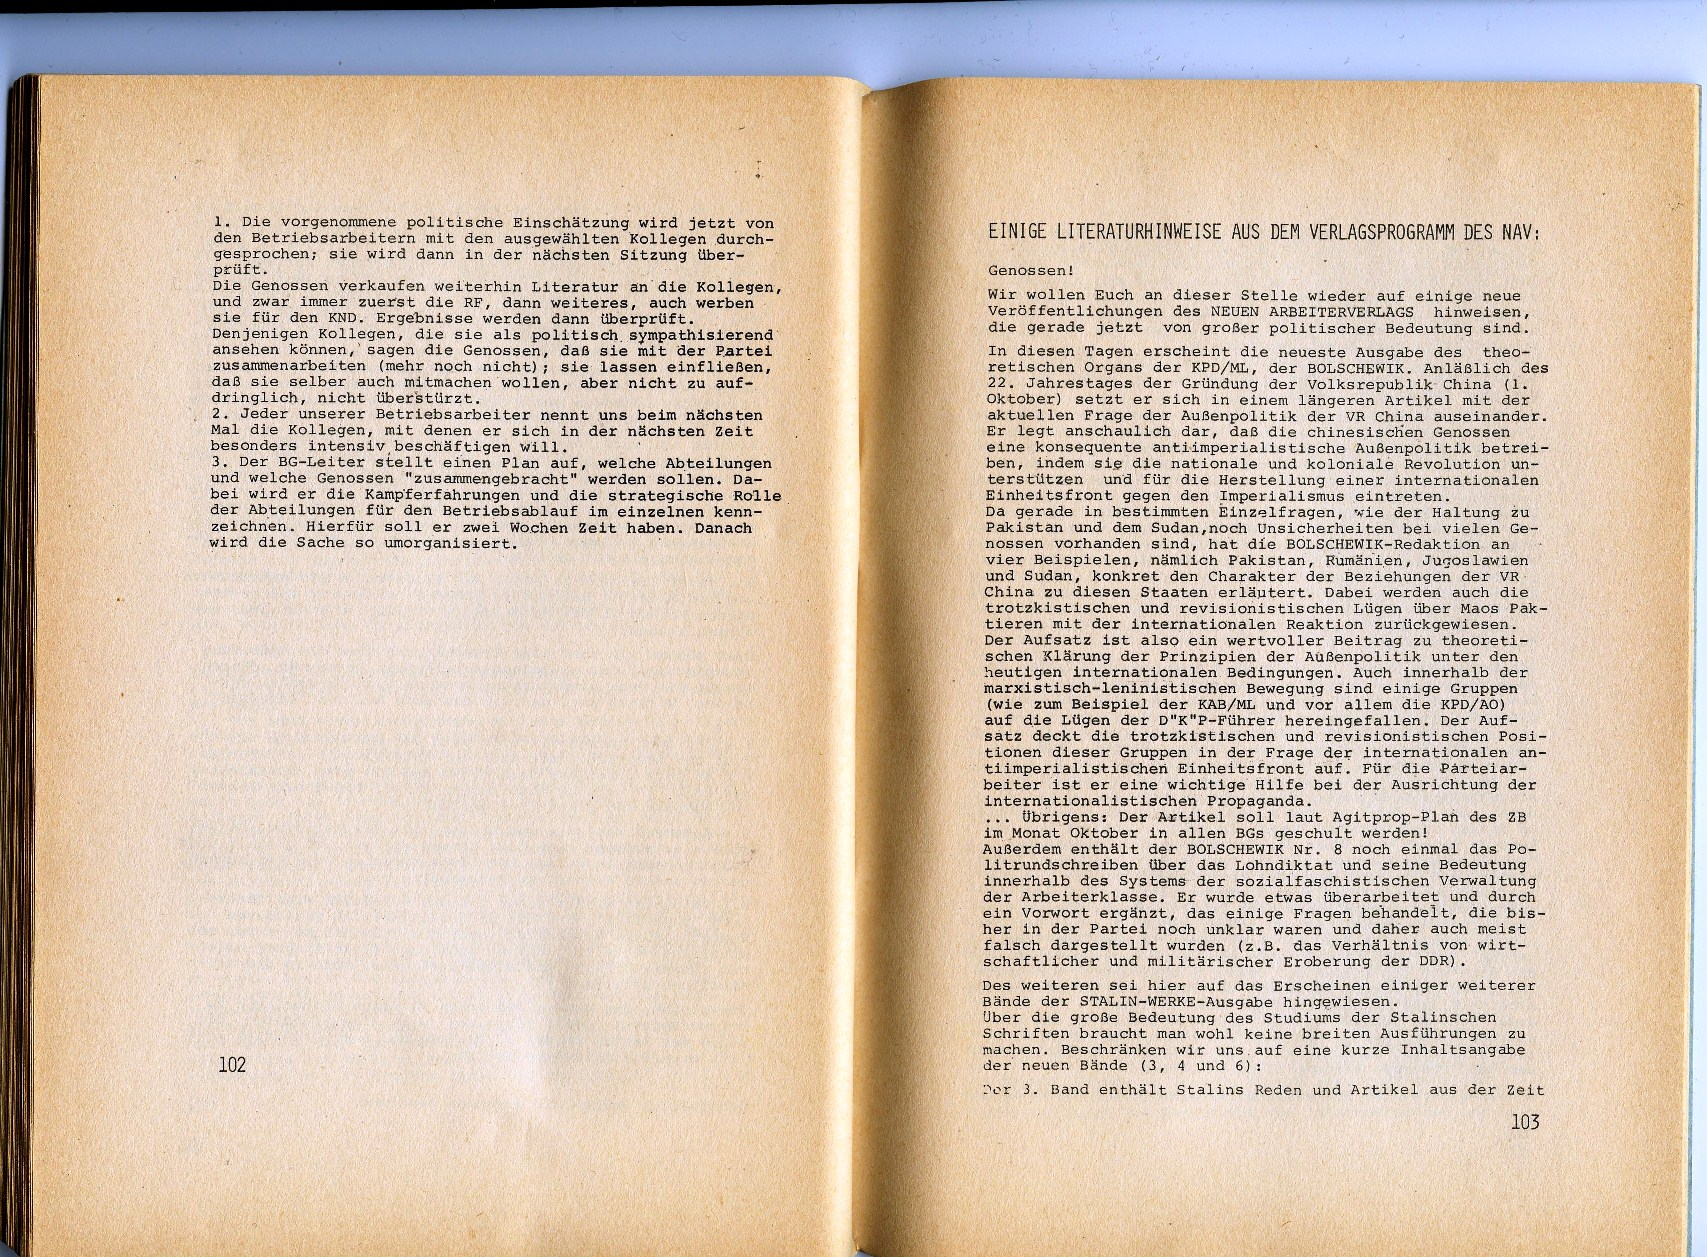 ZB_Parteiarbeiter_1971_08_53